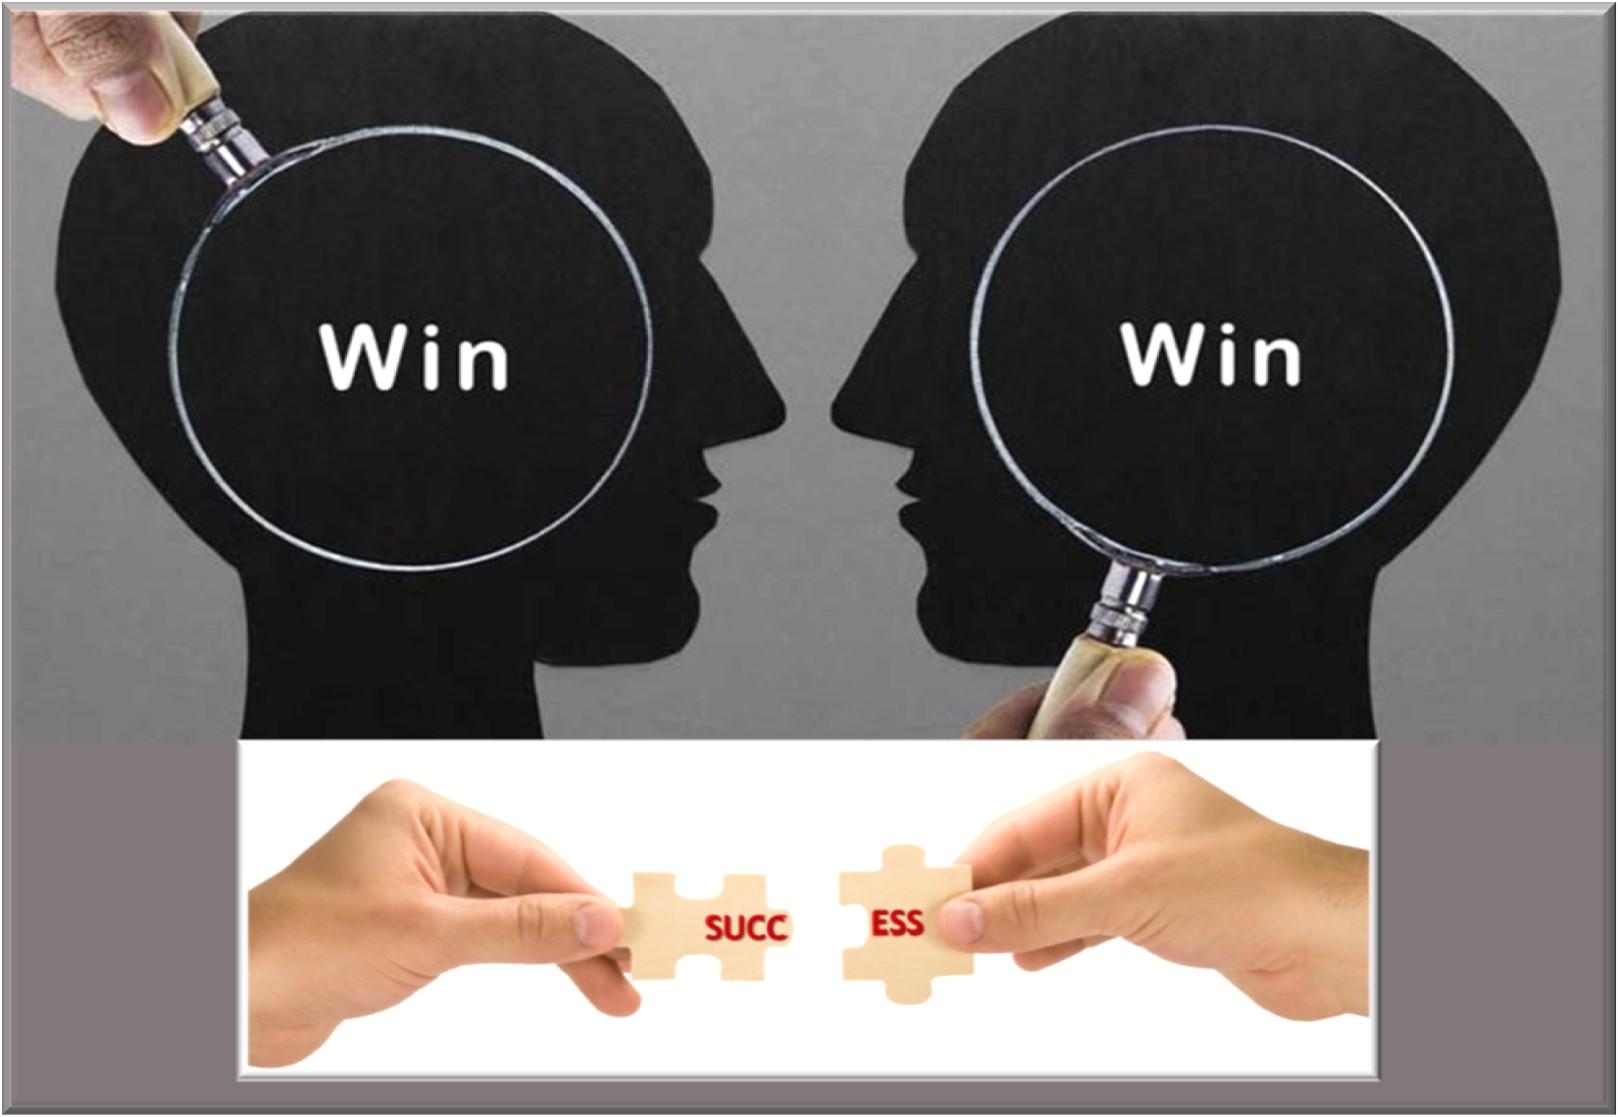 2018 In Retrospect – Real World Evidence Of Win-Win CRO/Sponsor Relationships